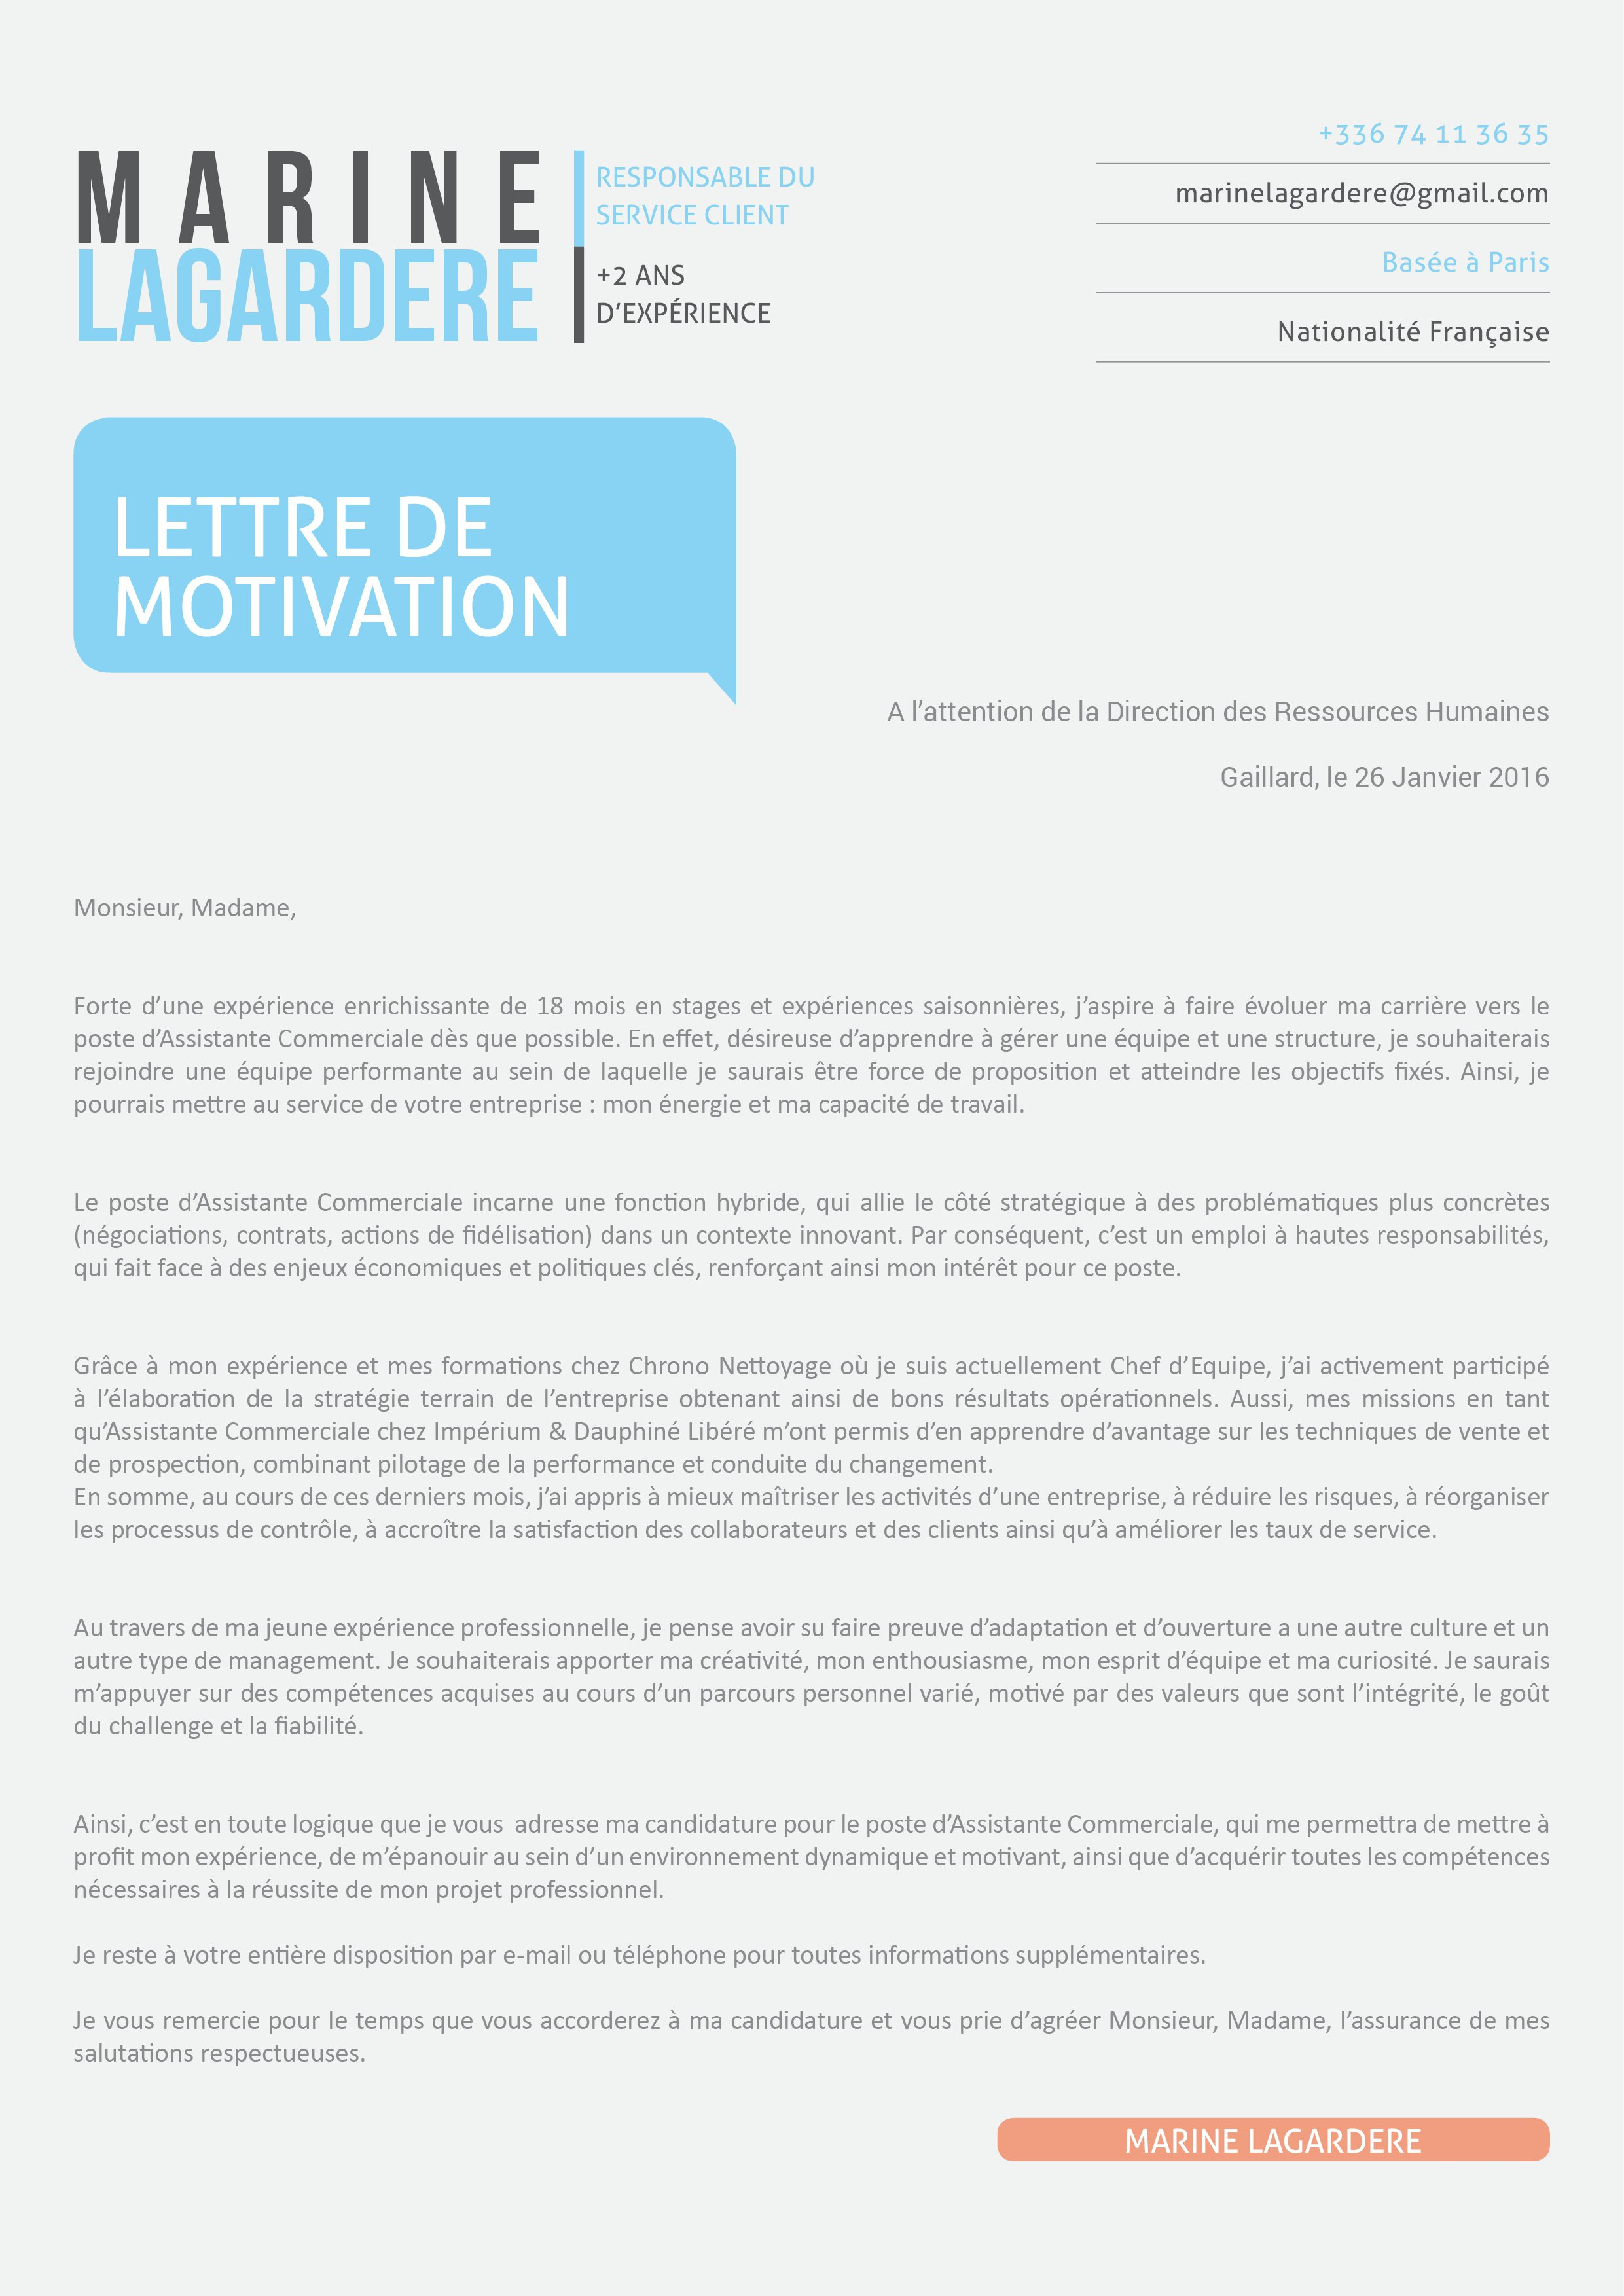 mycvfactory-cover-letter-la-bleu-ciel-0_qG1KZDS.jpg